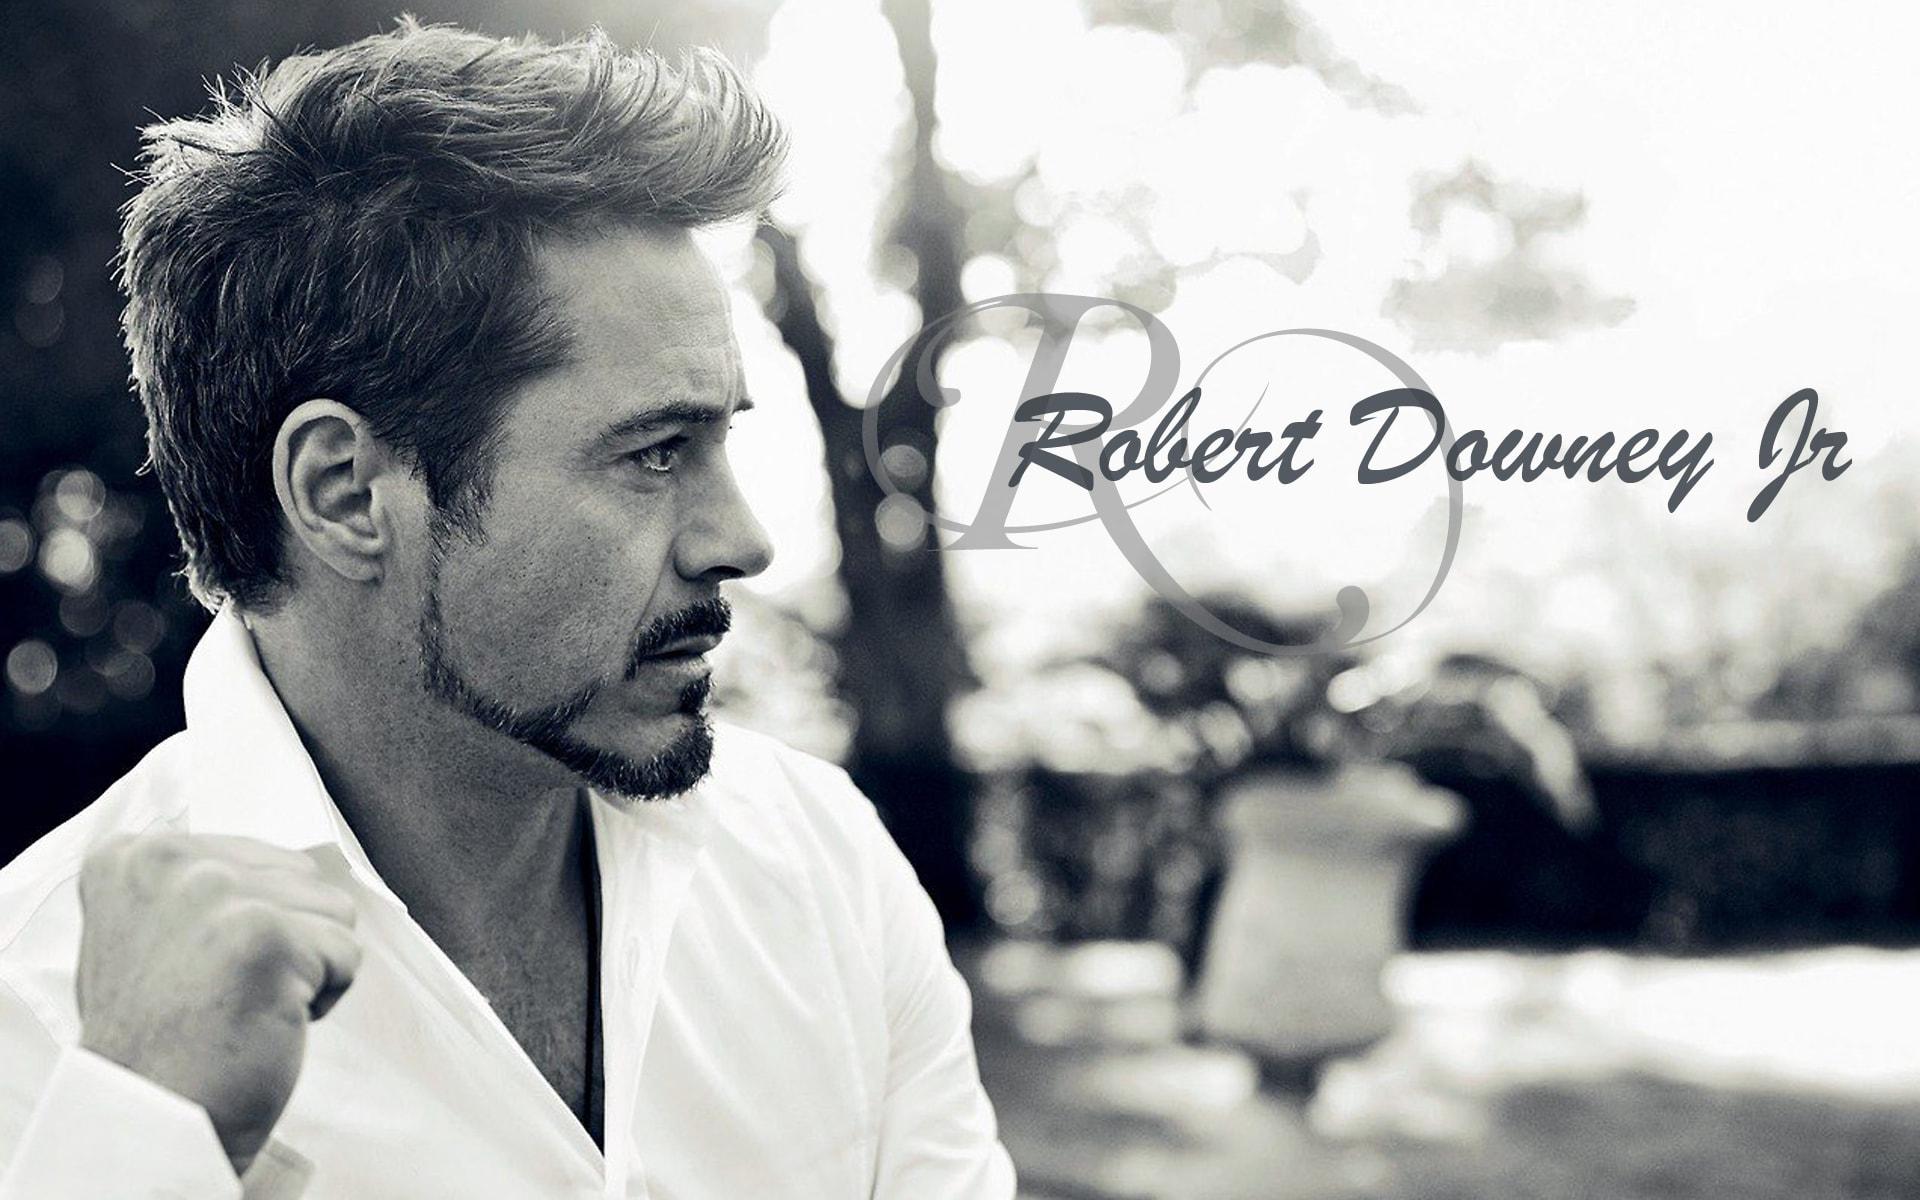 Robert Downey, Jr. Background